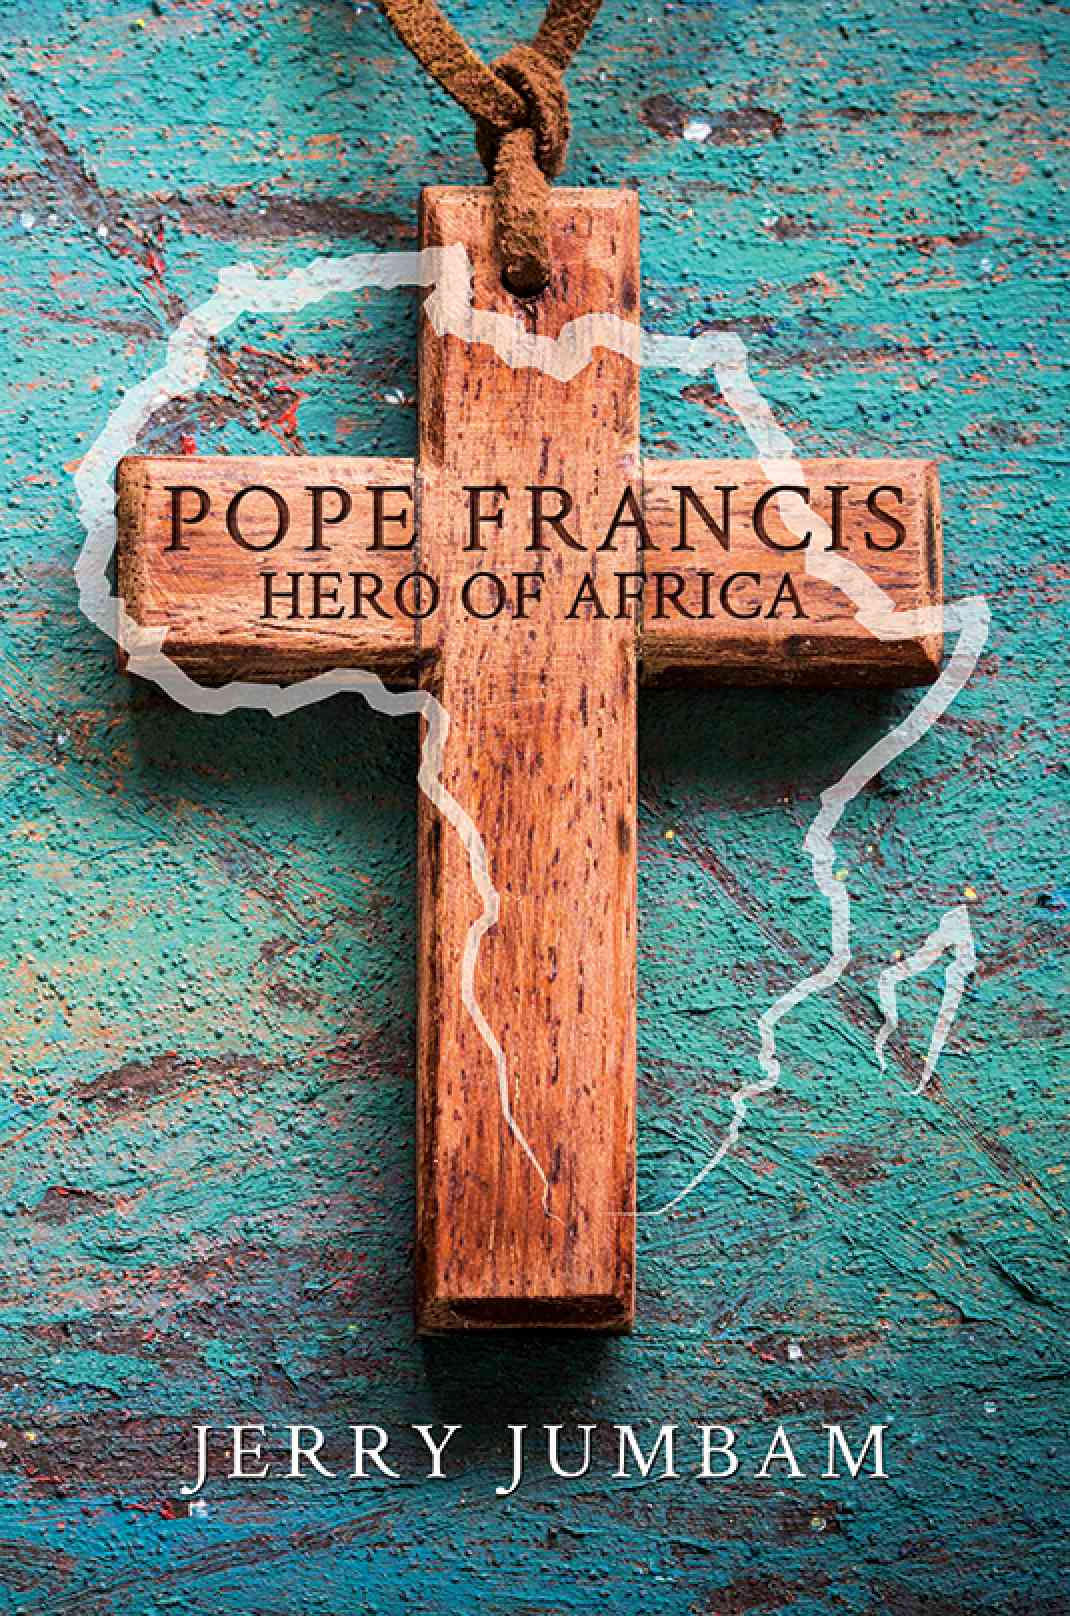 Pope Francis, Hero of Africa